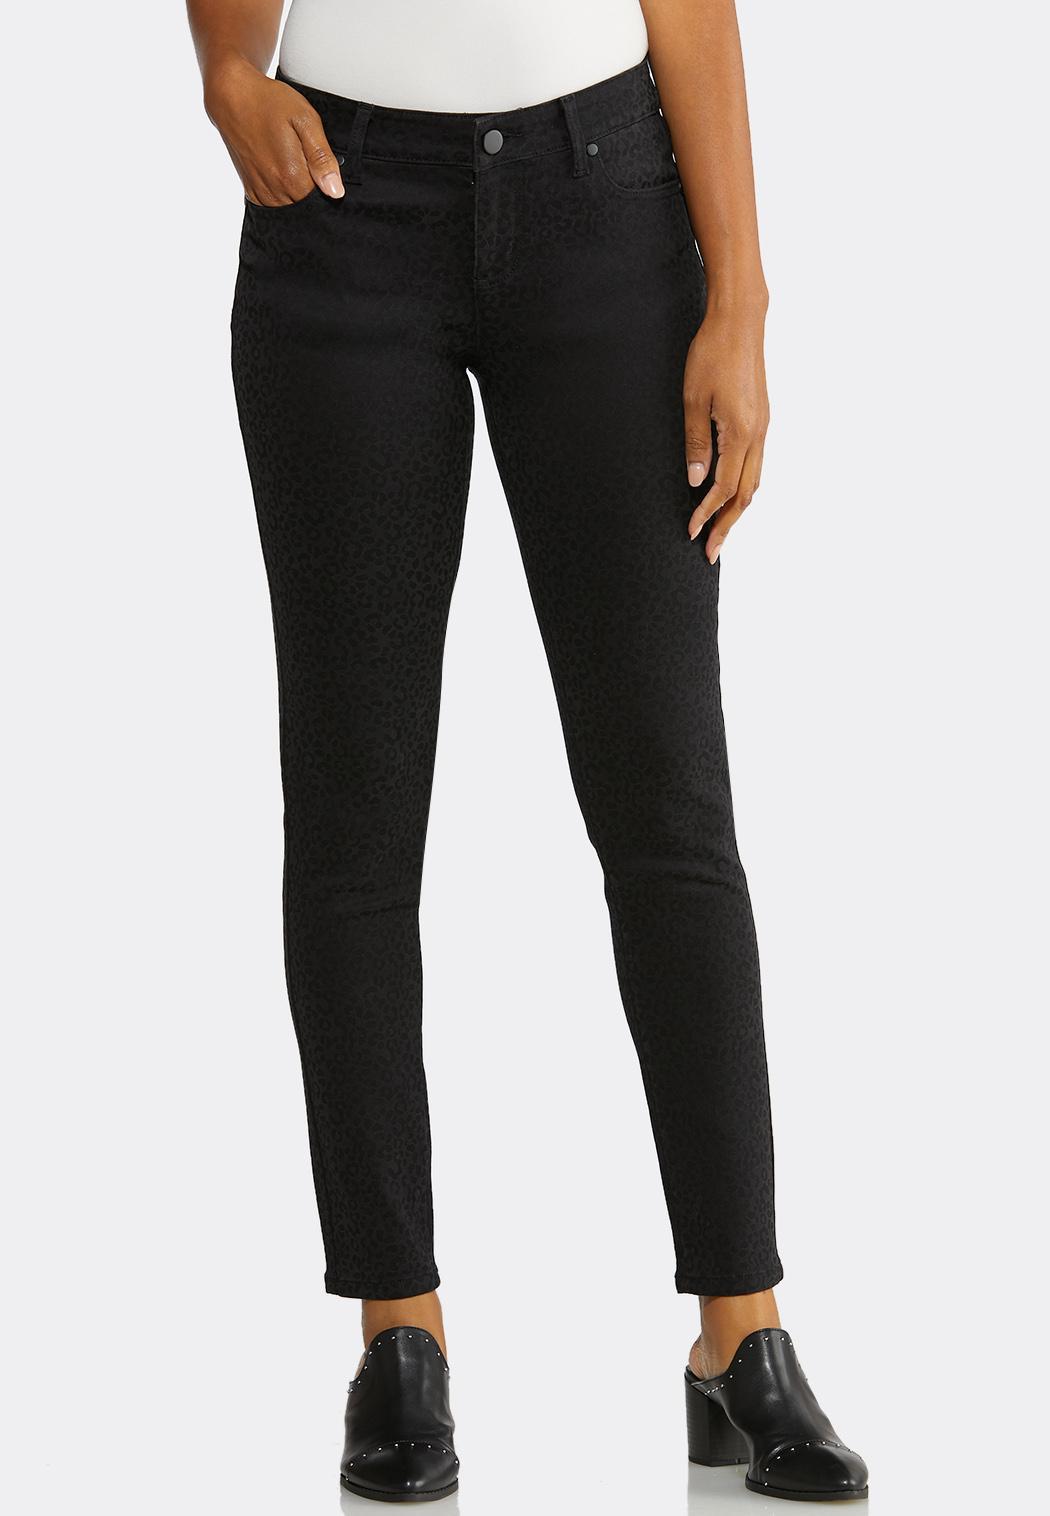 Tonal Leopard Jeans